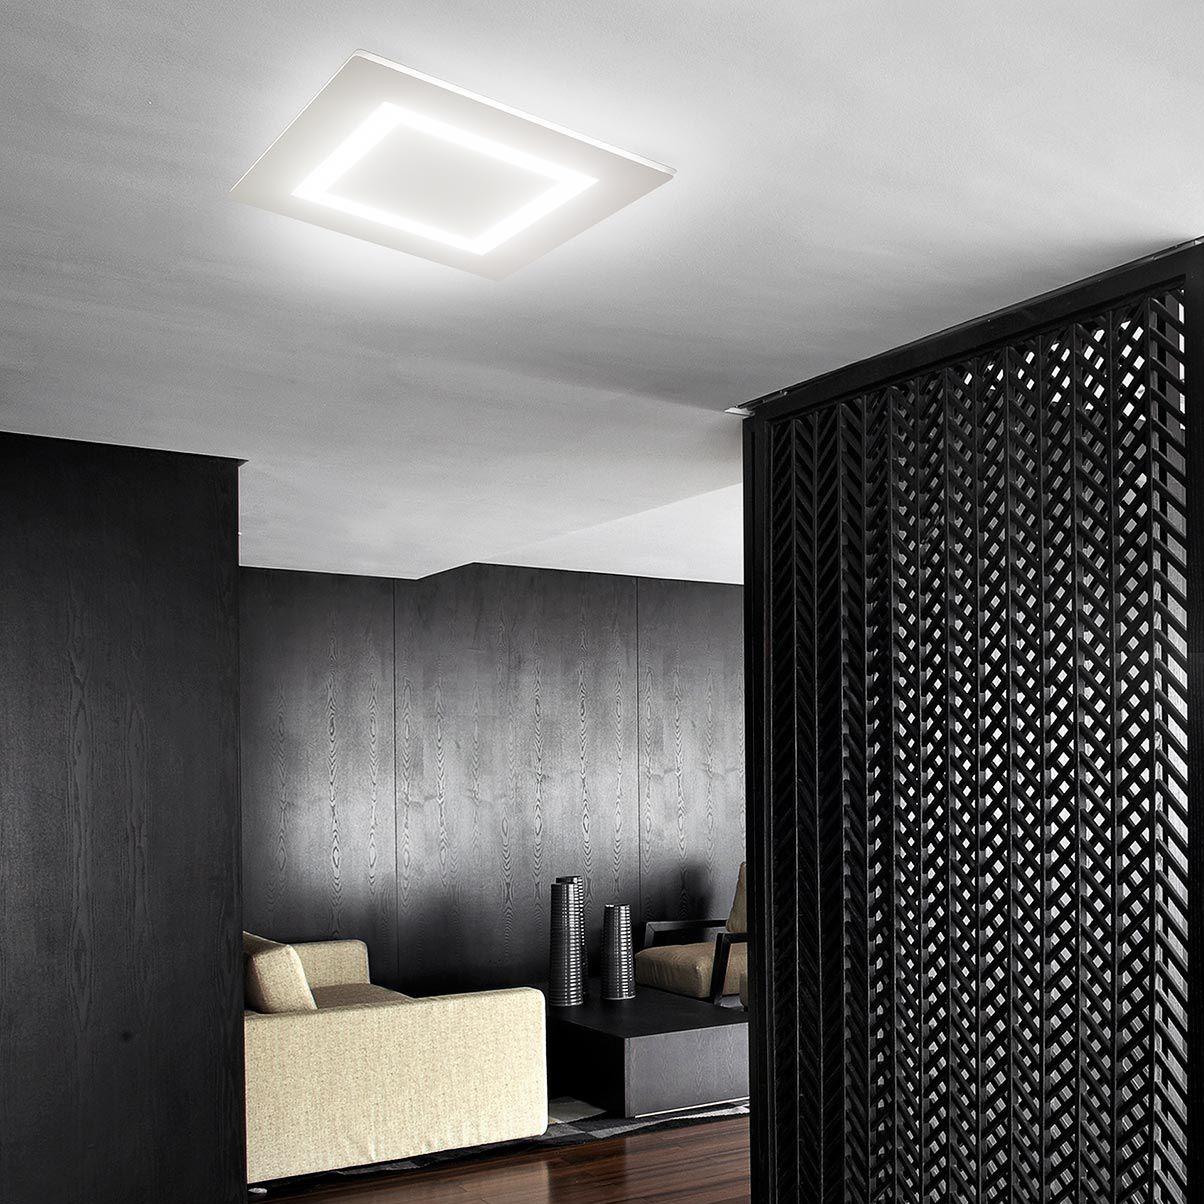 Plafoniera moderna / quadrata / in metallo / LED - FLAT - PANZERI